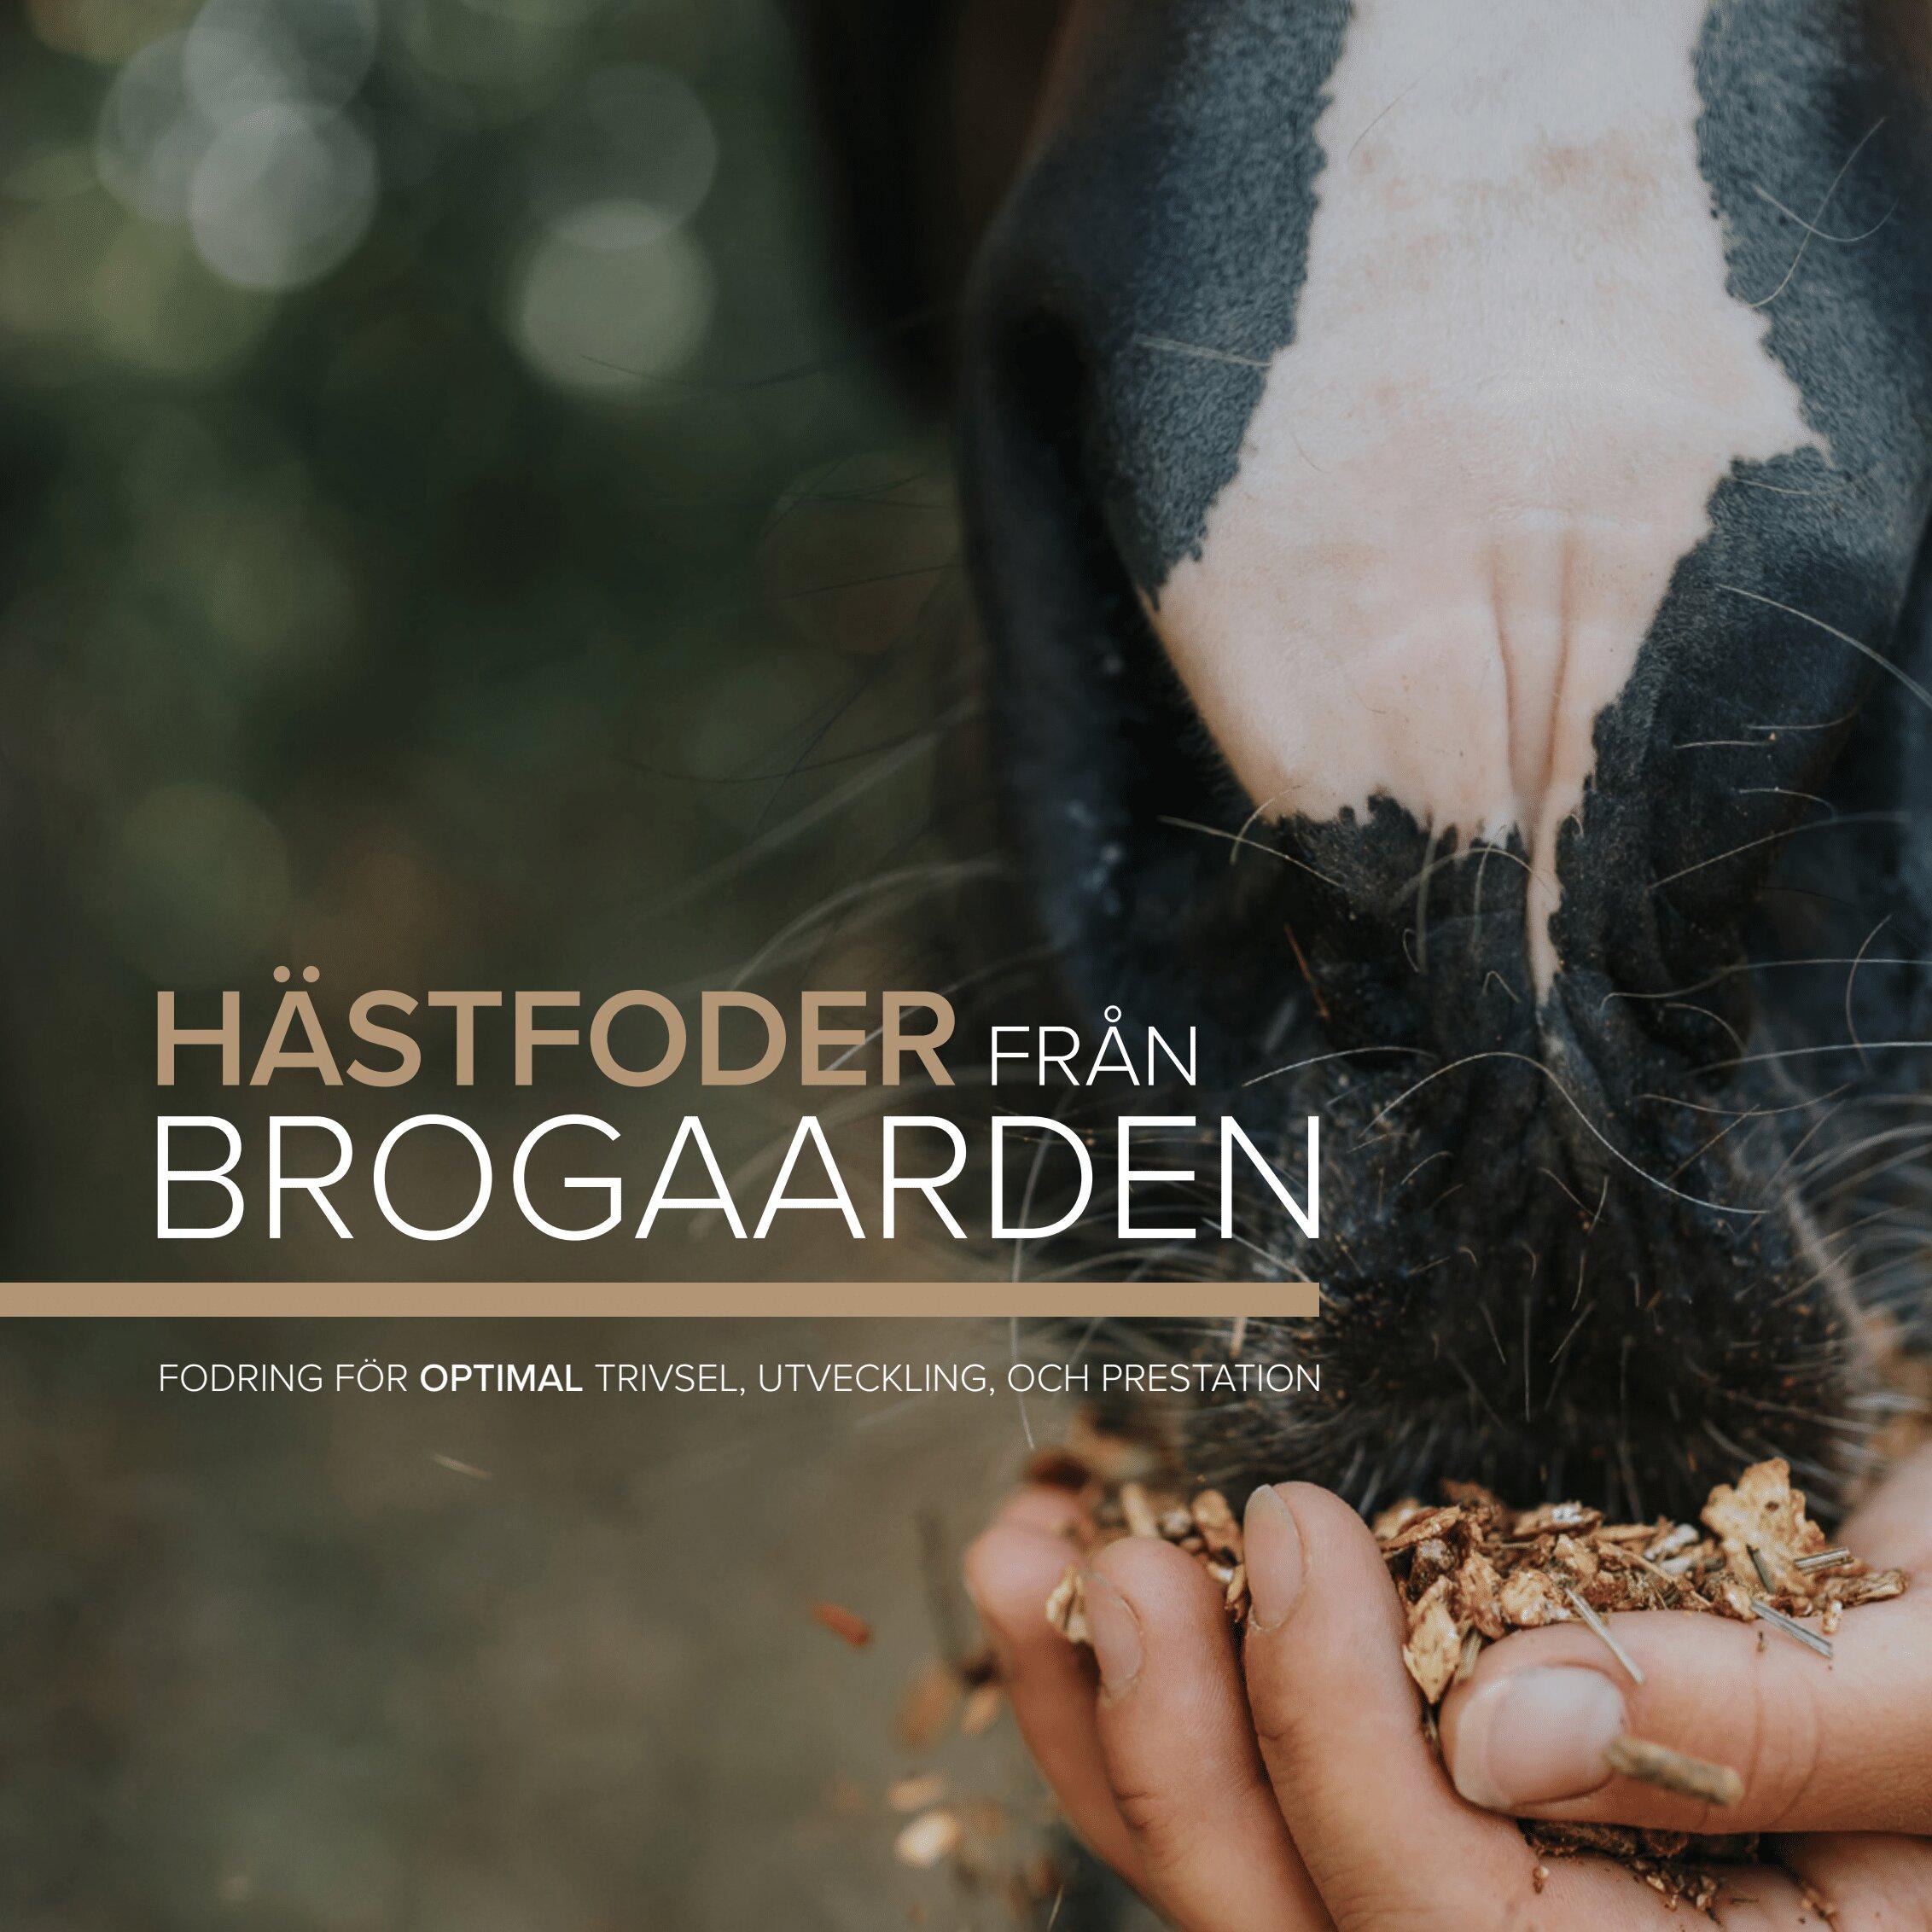 https://hogstaridsport.jetshop.se/pub_docs/files/Foder-fran-Brogaarden.png